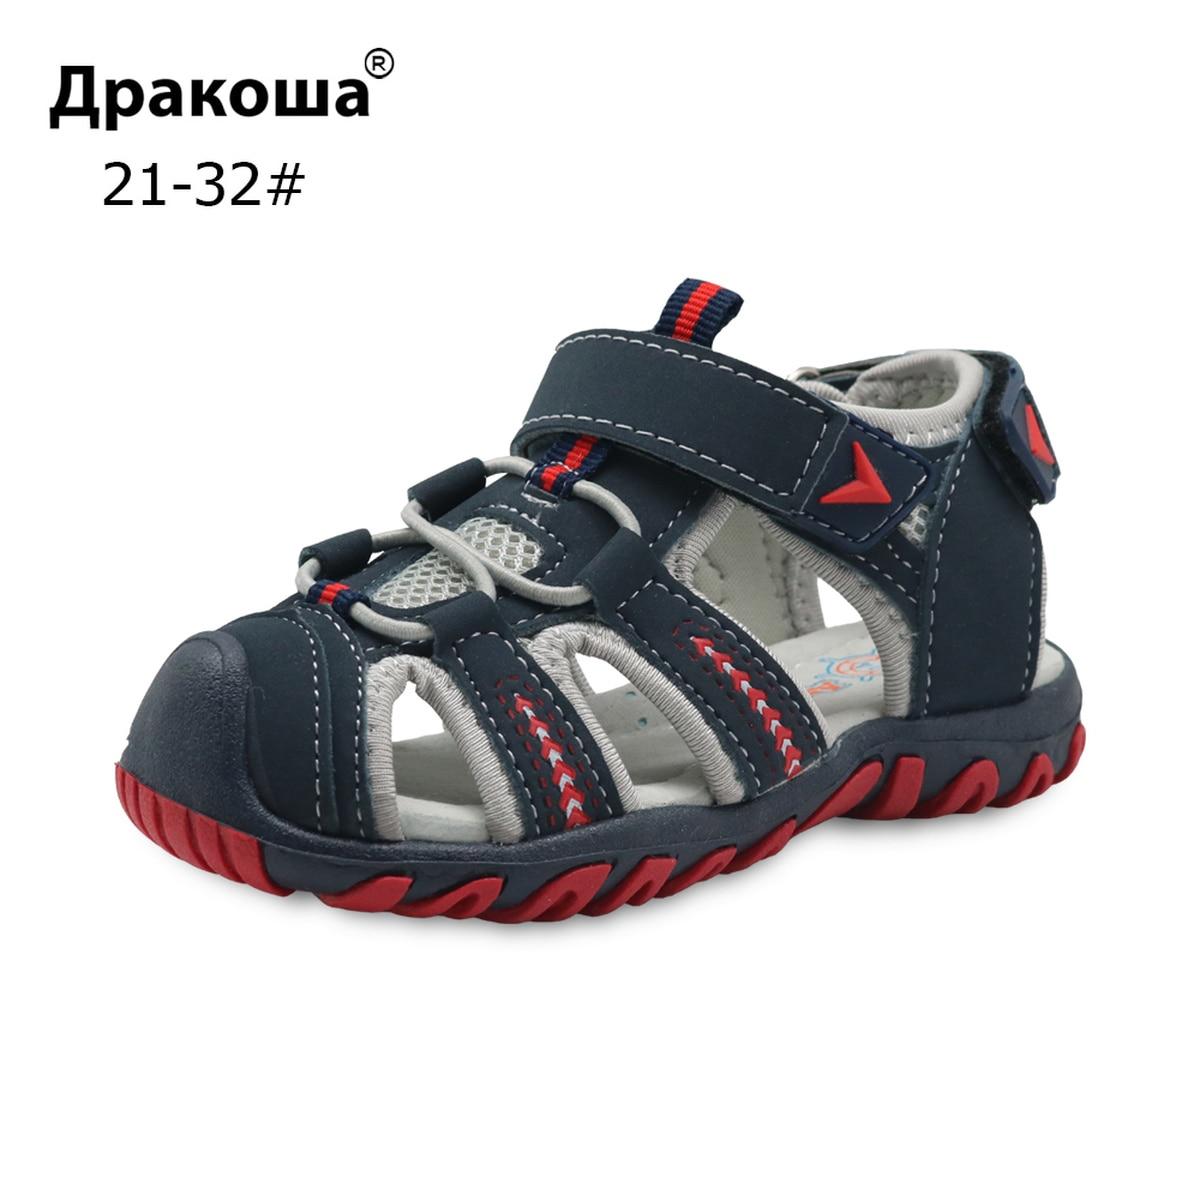 Apakowa Summer Sandals Boys New Fashion Kids Sport Sandals Arch Support Non-slip Toddler Beach Sandals For Children's Shoes